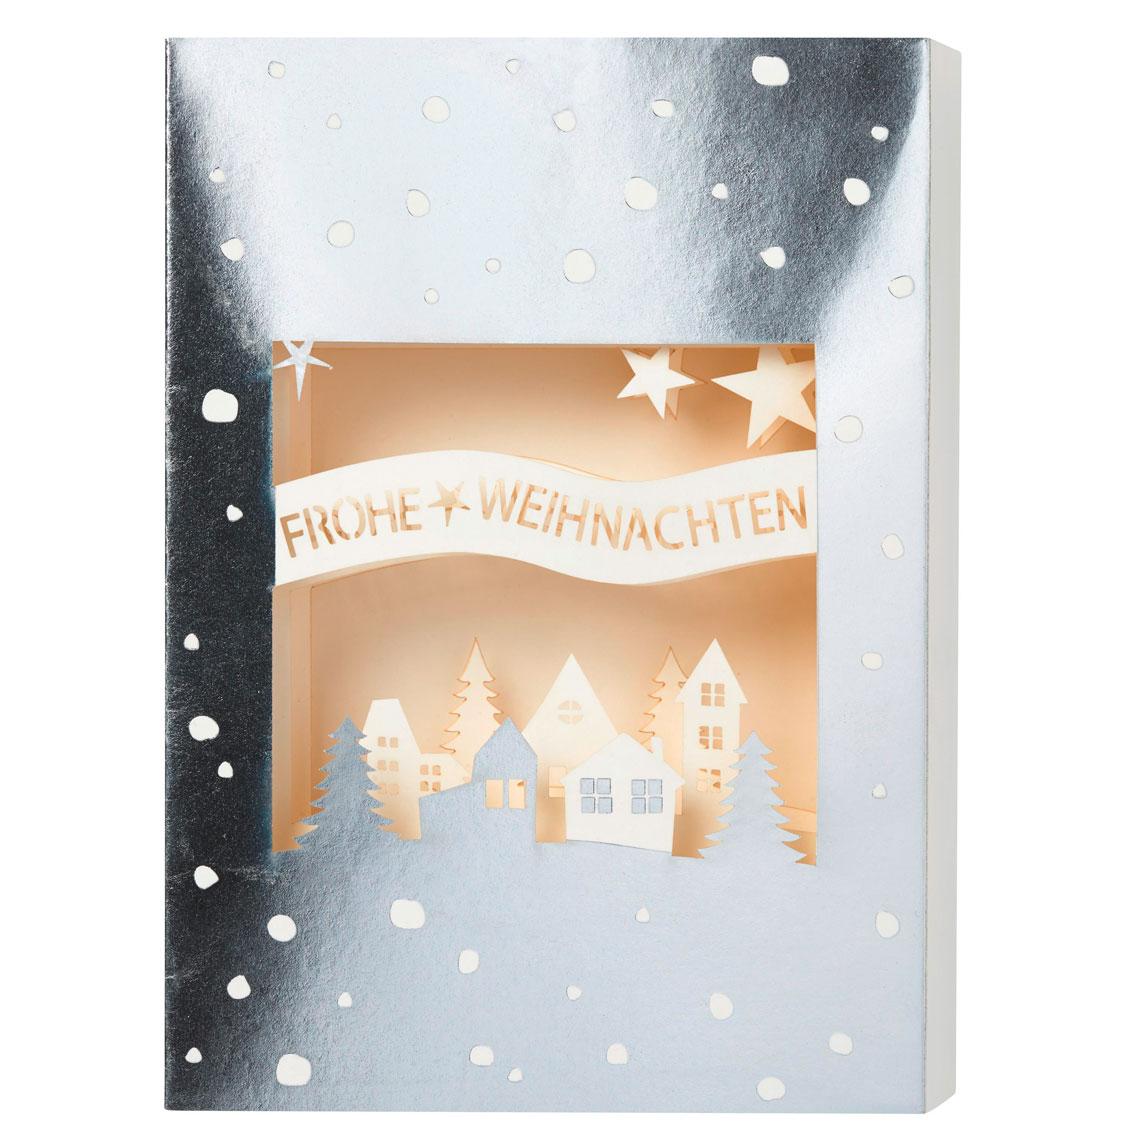 Karte Frohe Weihnachten.Christmas Lasercut Karte Frohe Weihnachten